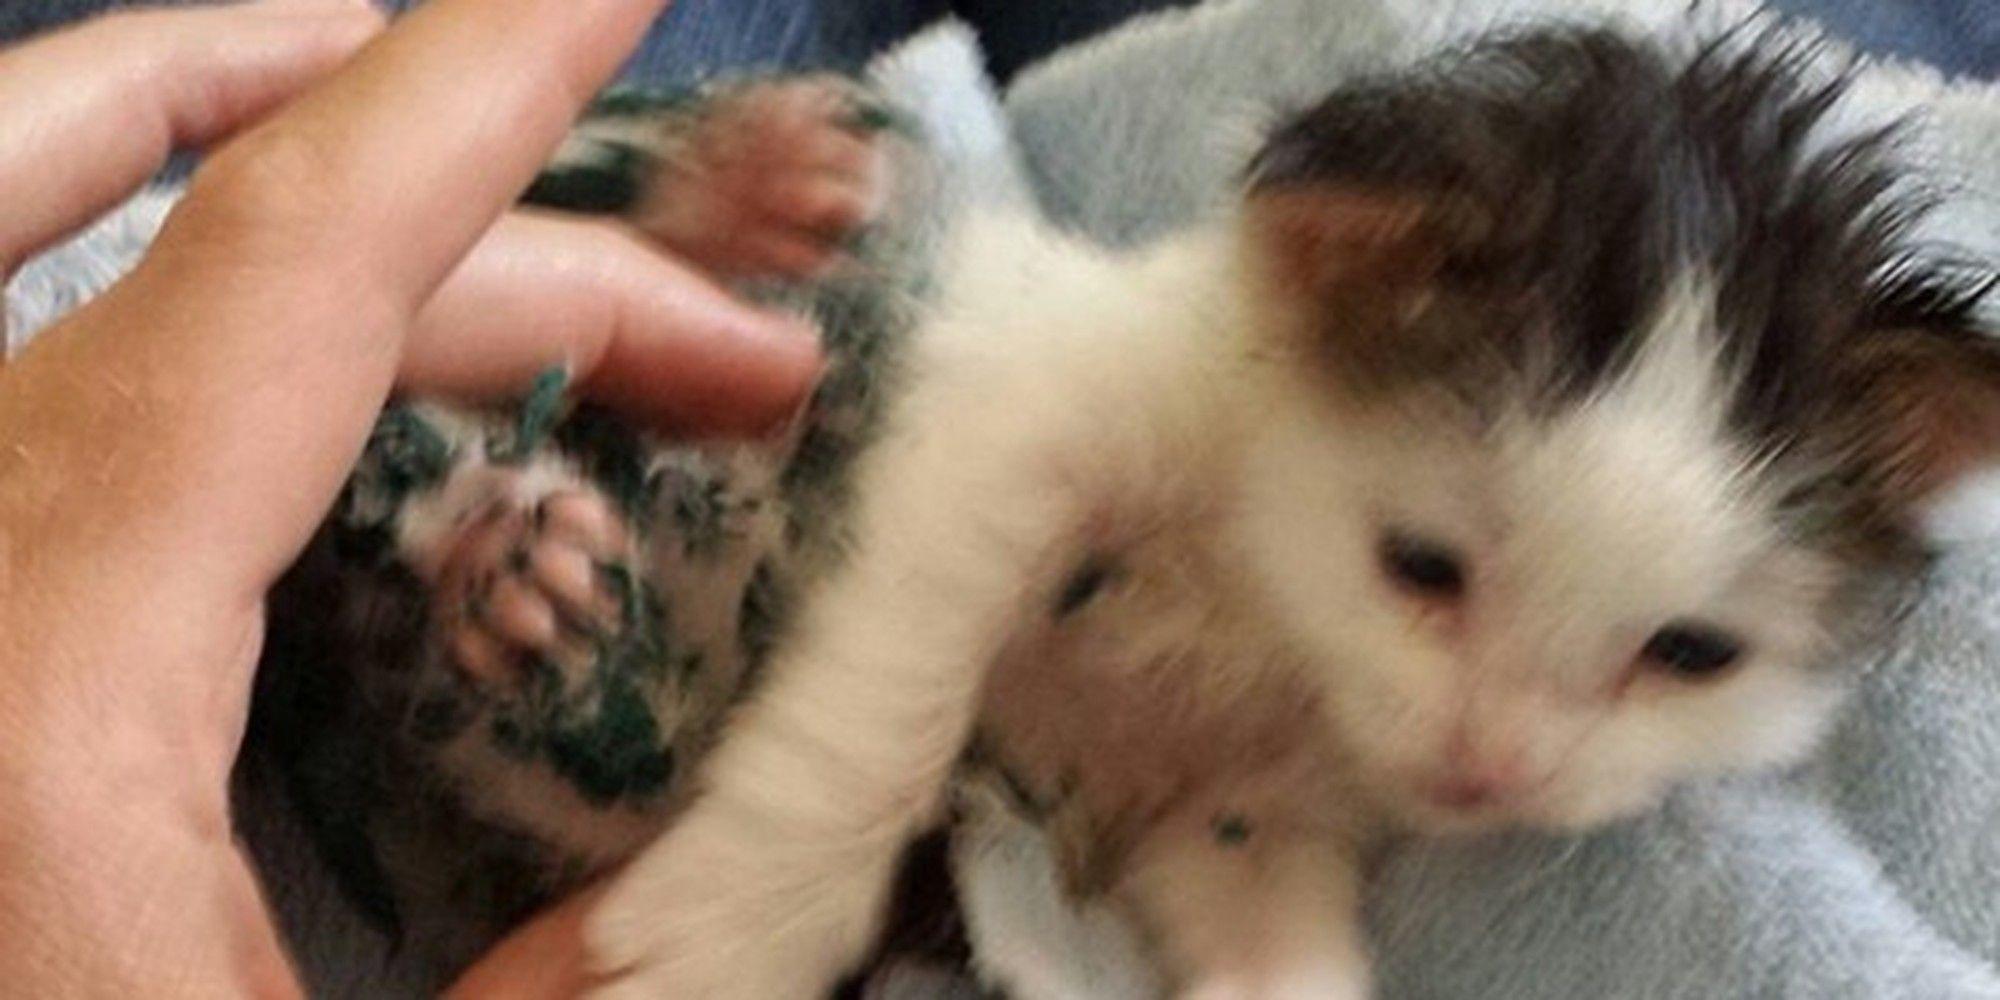 They Try To Find The Hero Who Saved Paint Covered Kitten In Dumpster Kitten Photos Kitten Tiny Kitten